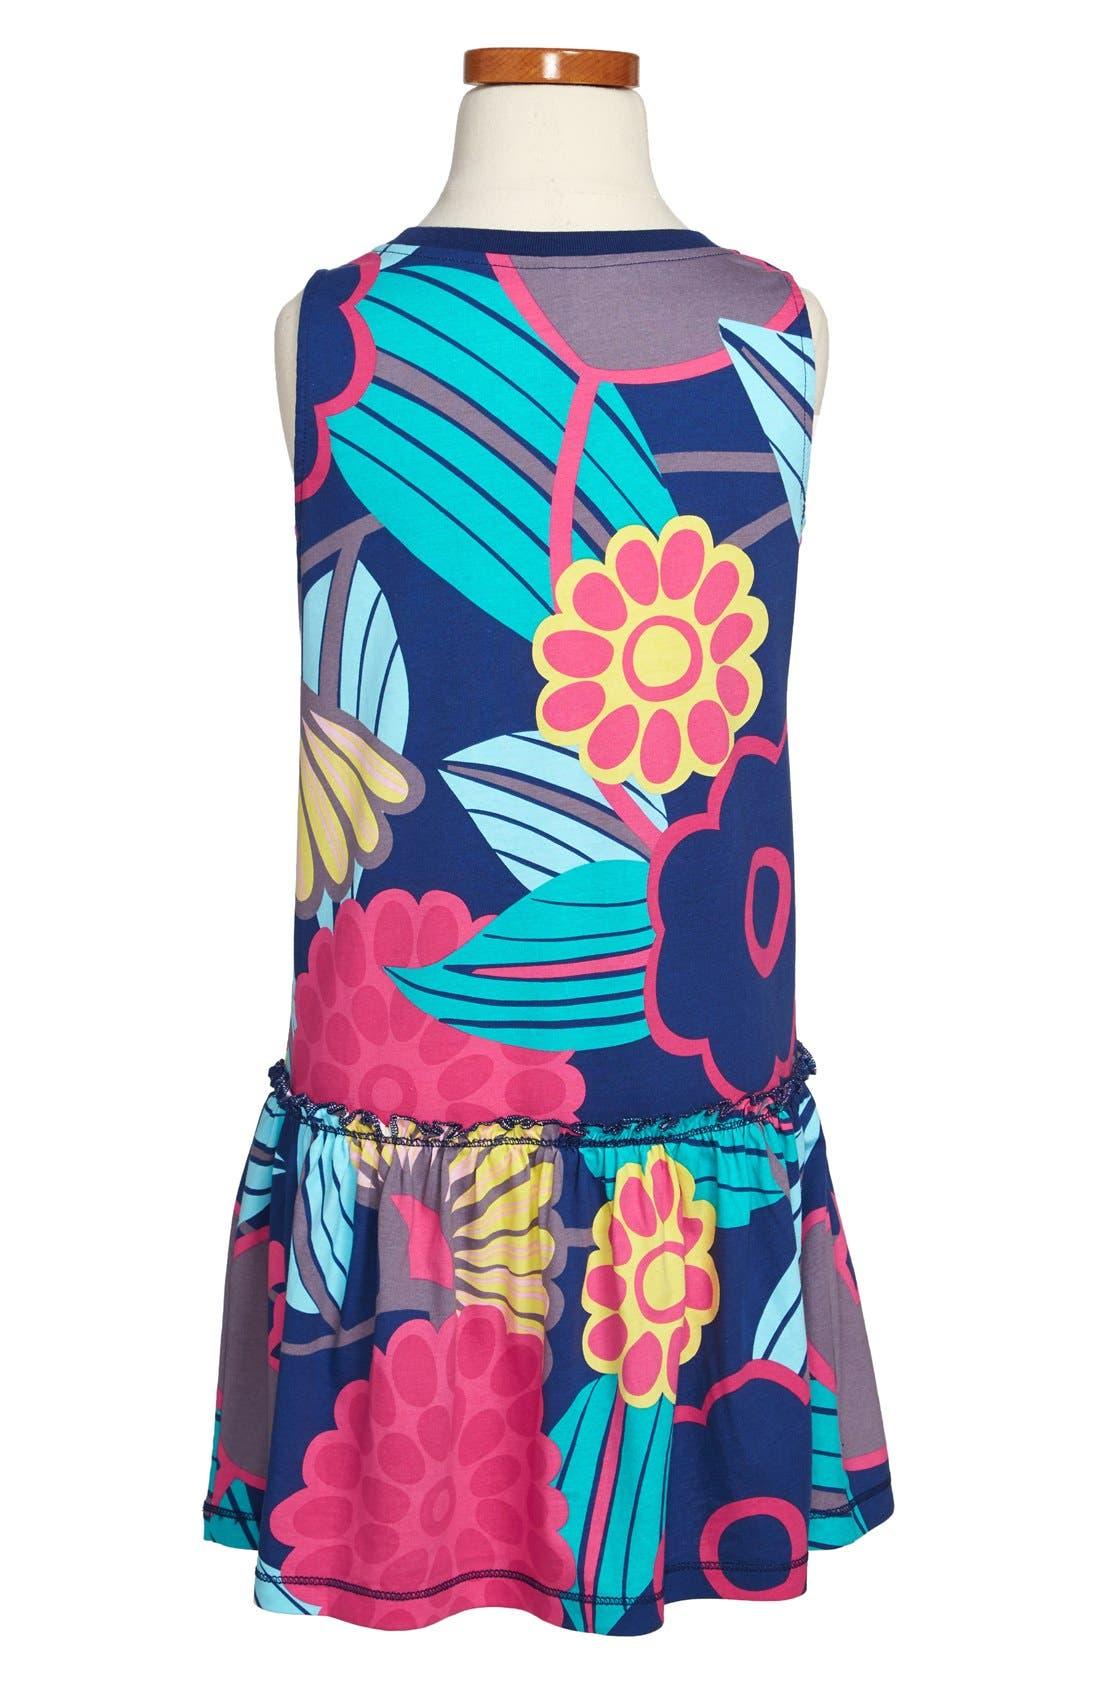 Alternate Image 2  - Tea Collection 'Mod Gypsy' Print Dress (Toddler Girls, Little Girls & Big Girls)